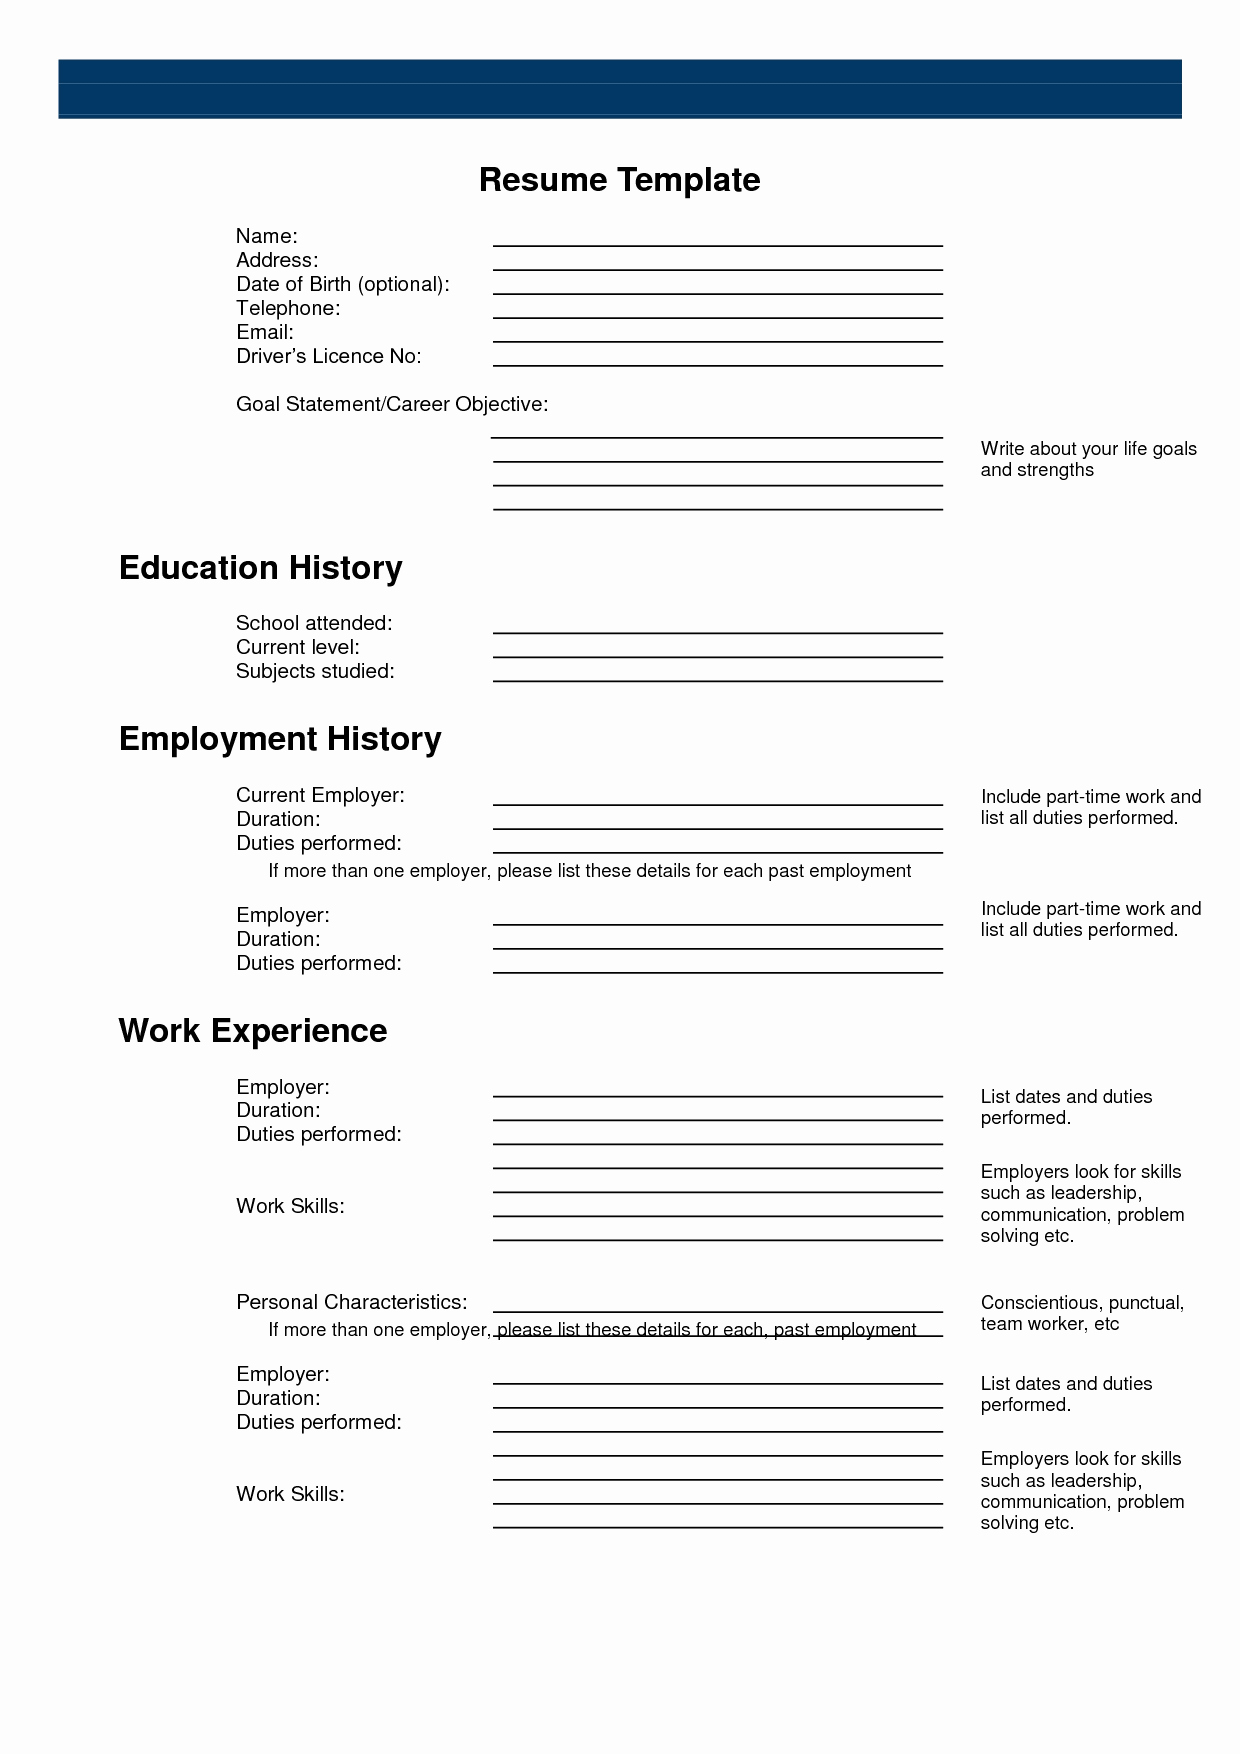 Free Resume Builder Templates